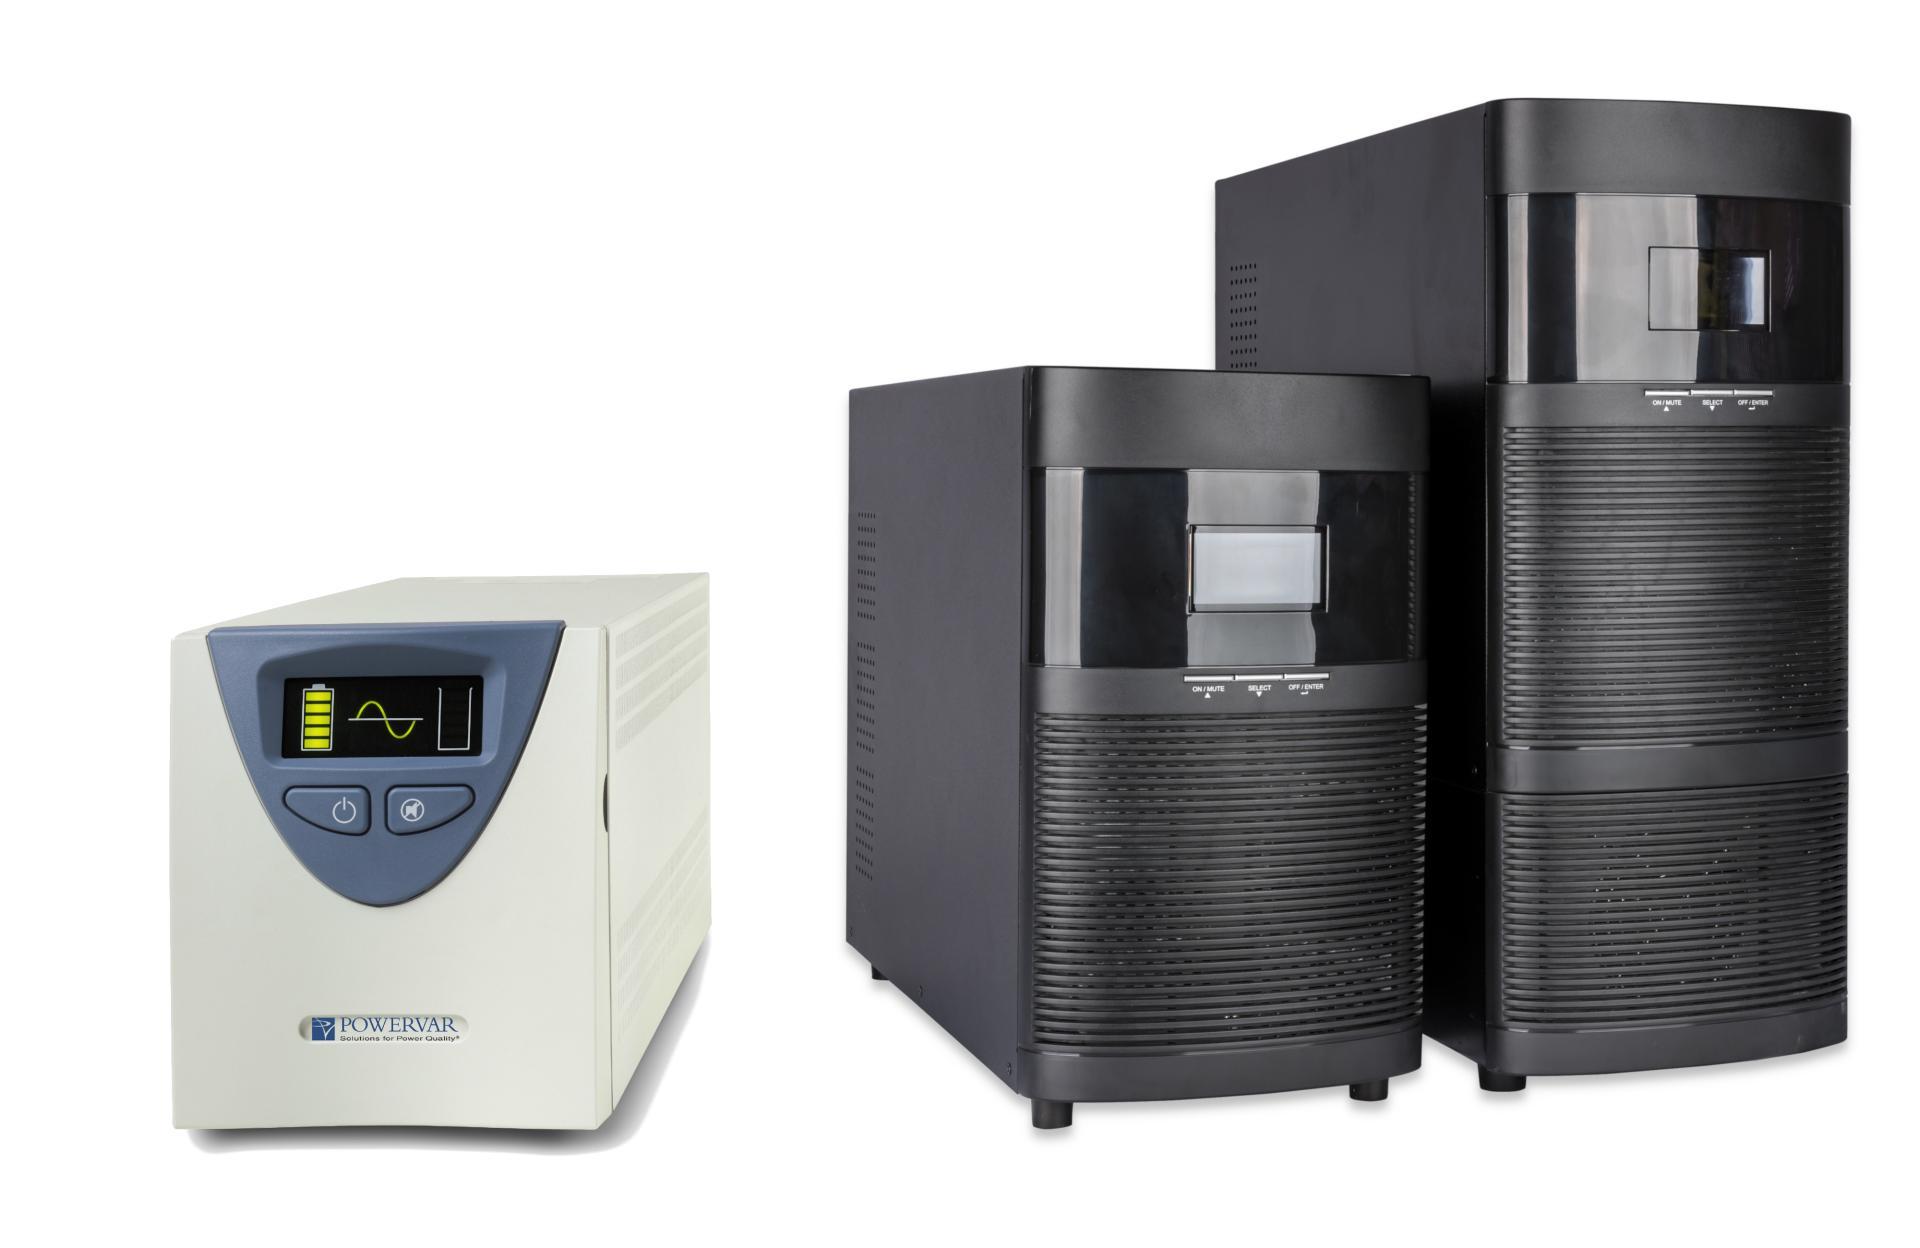 powervar-security-ii-upm-power-inspired-tx-series